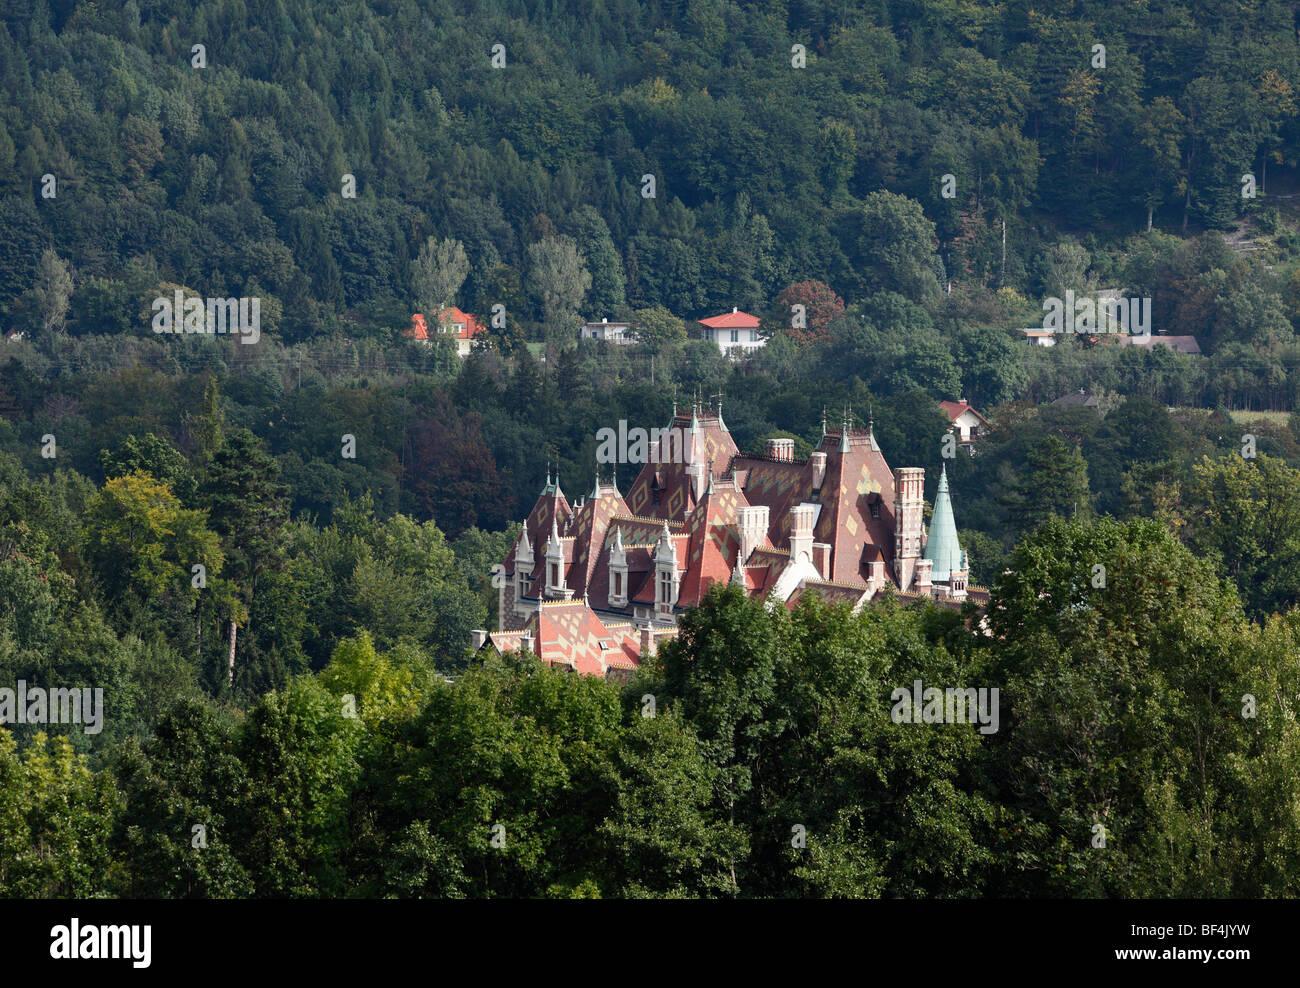 Schloss Rothschild Palace, Reichenau an der Rax, Lower Austria, Austria, Europe - Stock Image